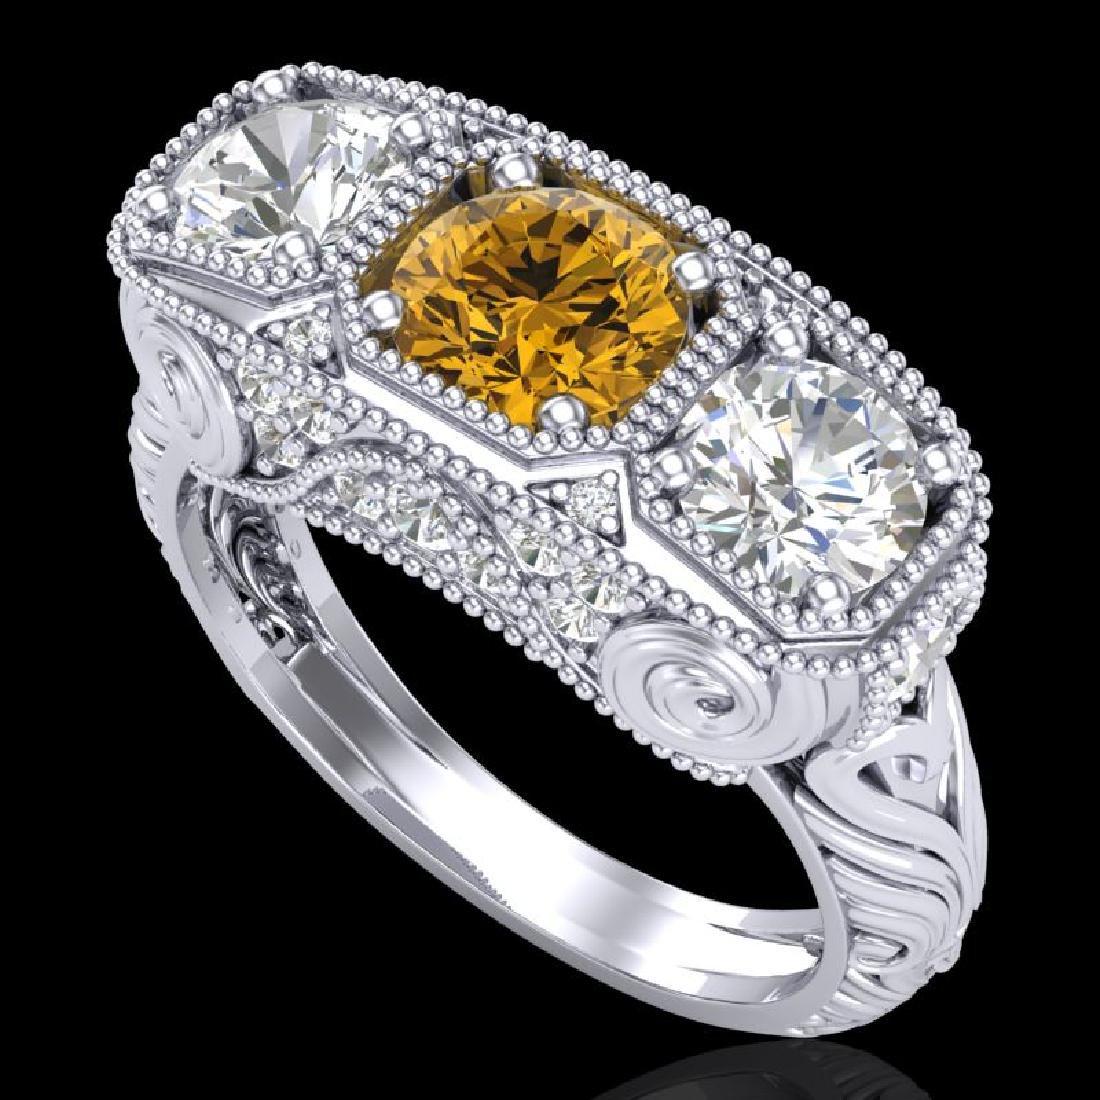 2.51 CTW Intense Fancy Yellow Diamond Art Deco 3 Stone